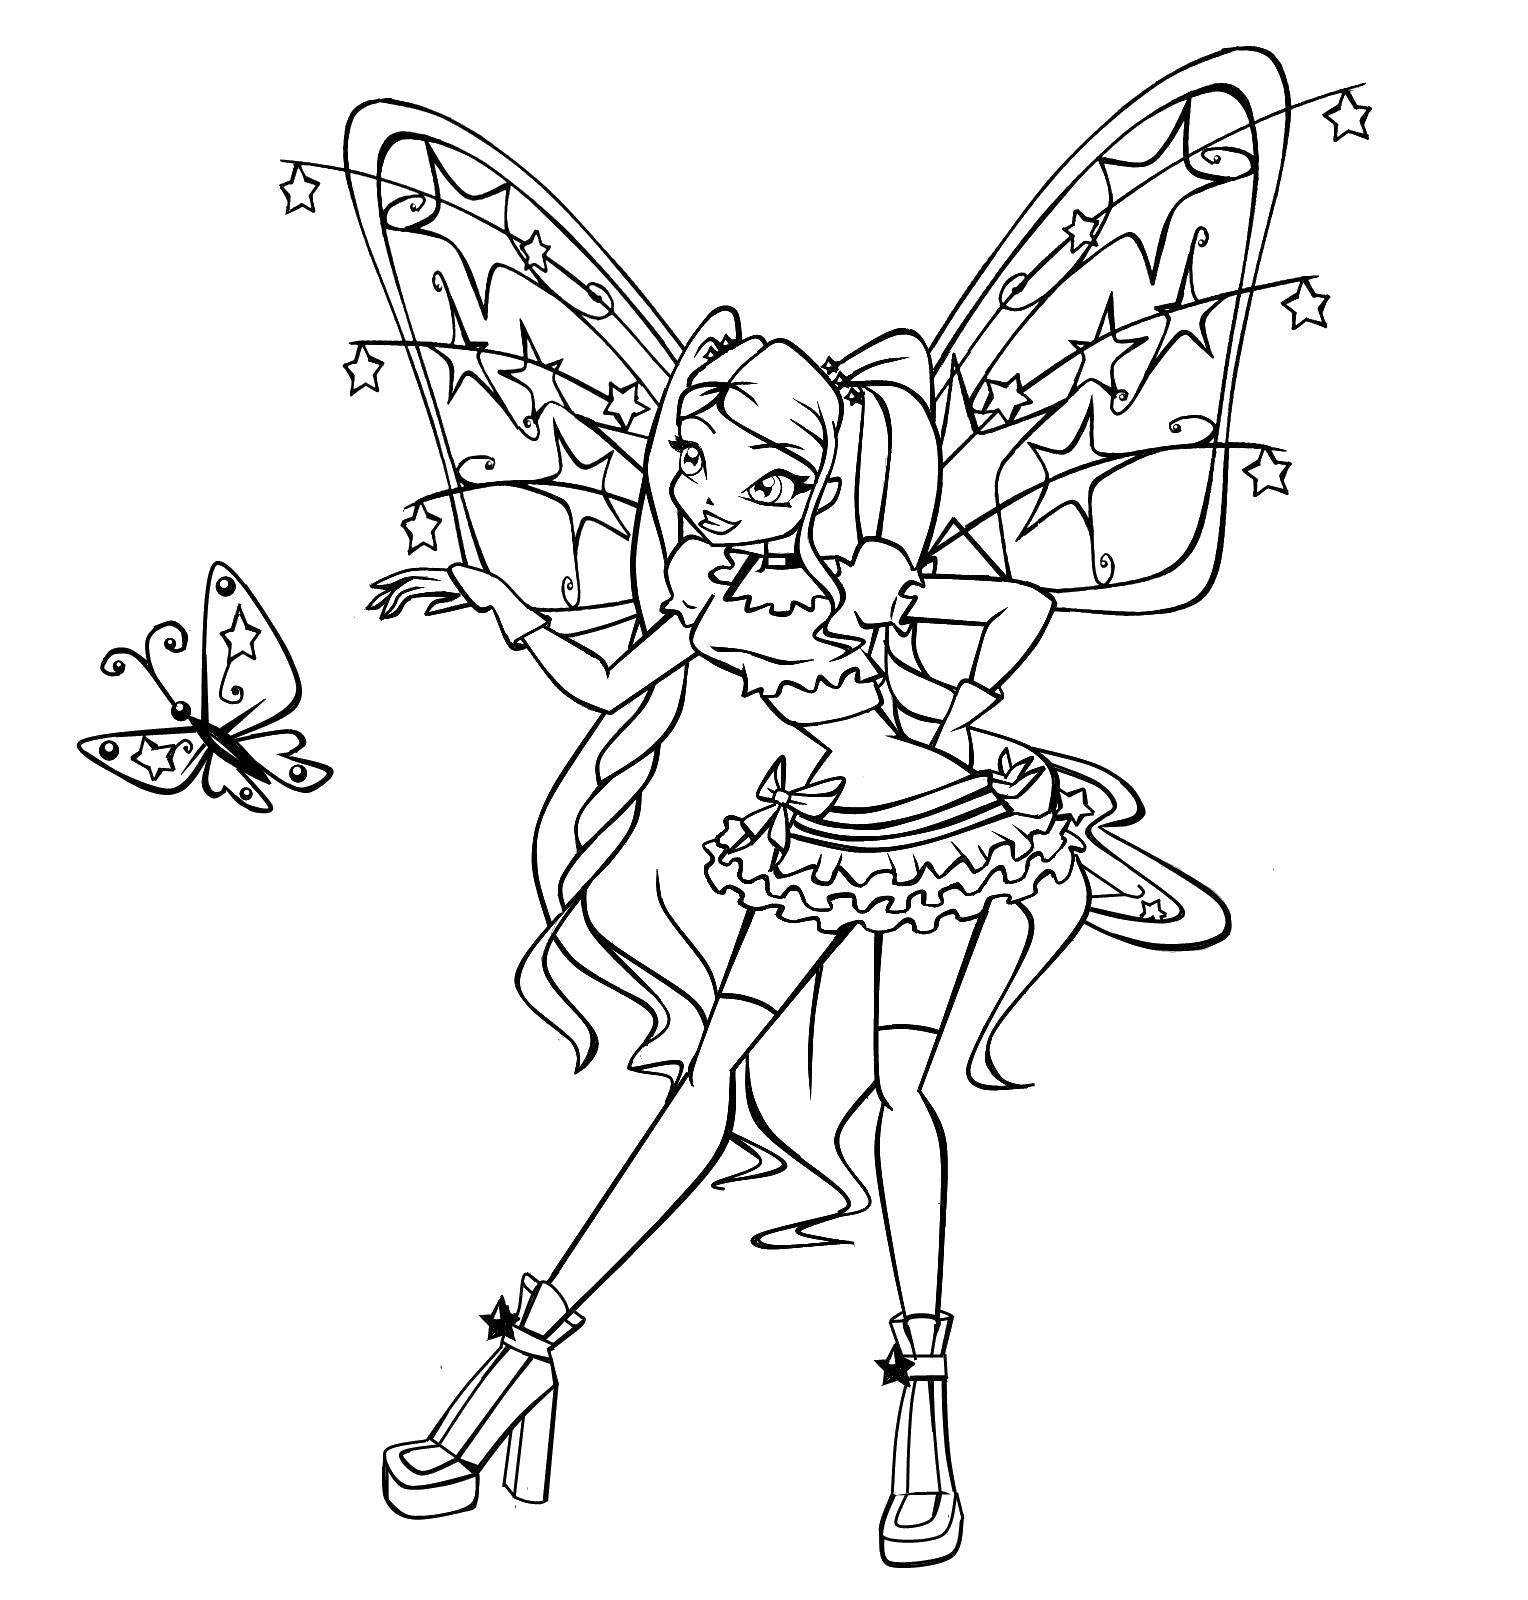 винкс разговаривает с бабочкой винкс с бабочкой раскраски